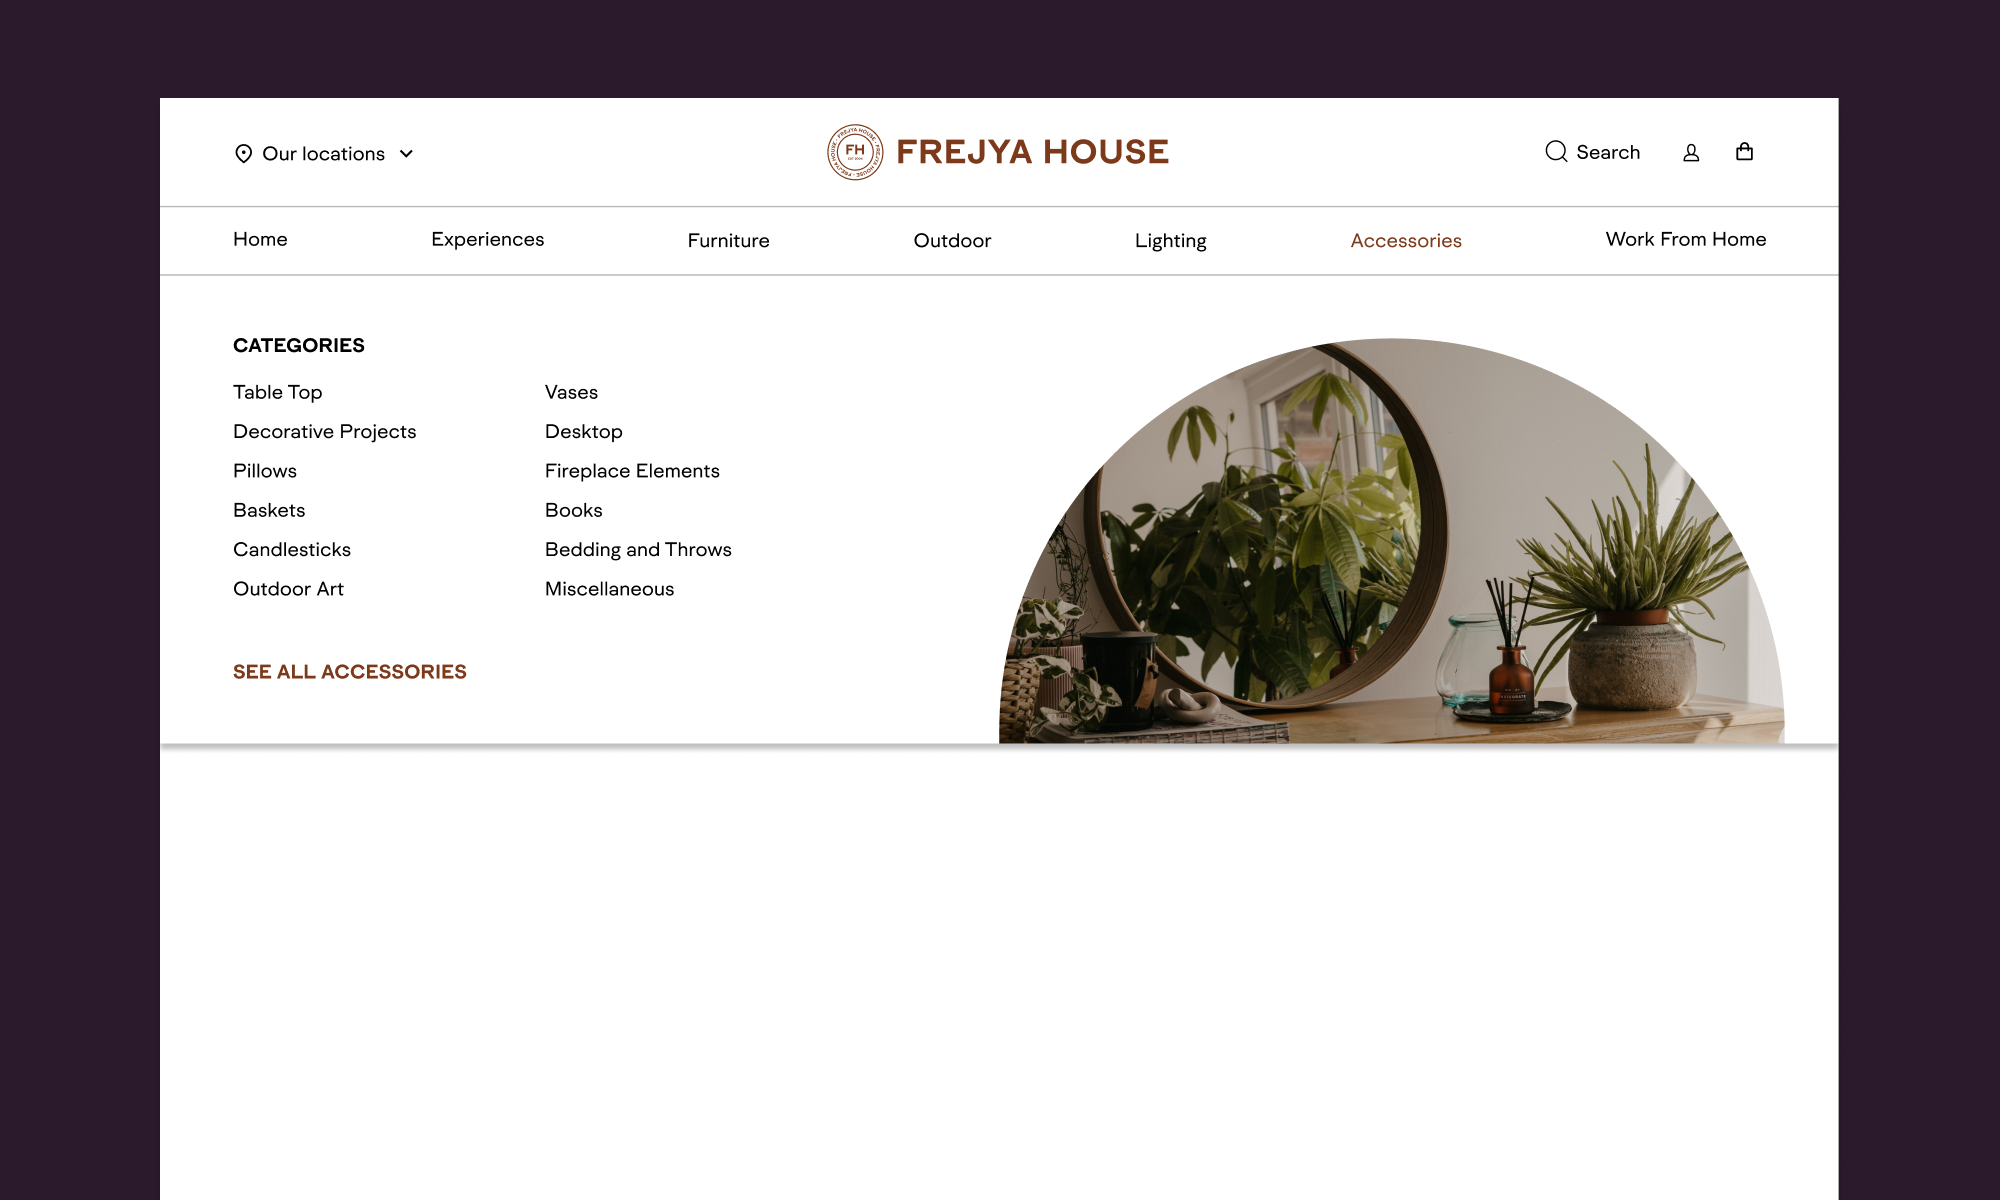 Frejya House - Rohan Pal